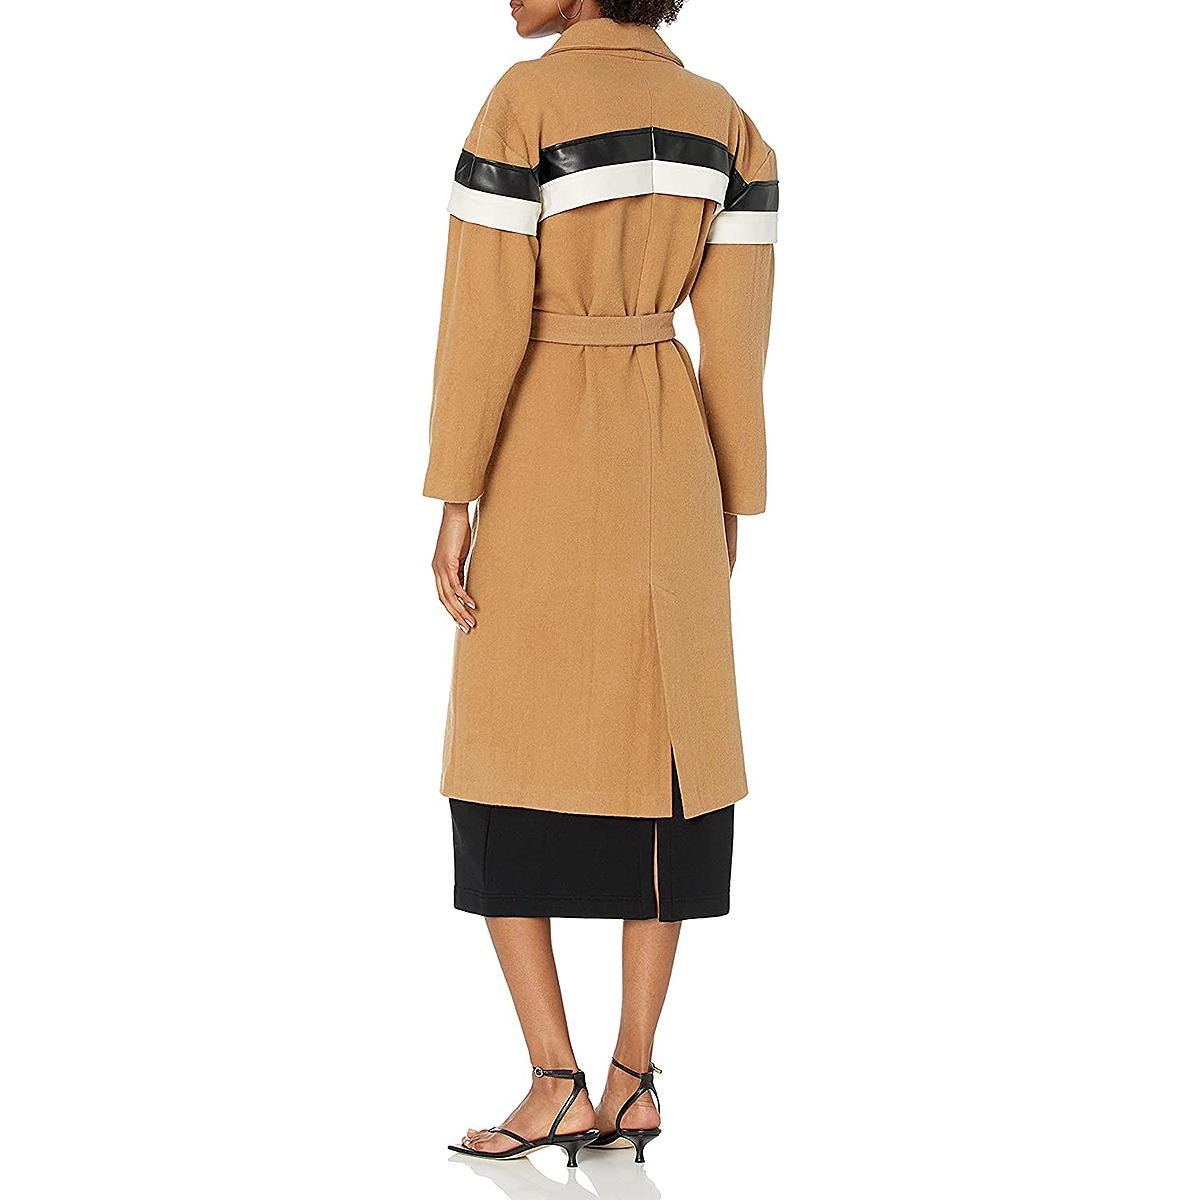 making-the-cut-amazon-andreas-wool-coat